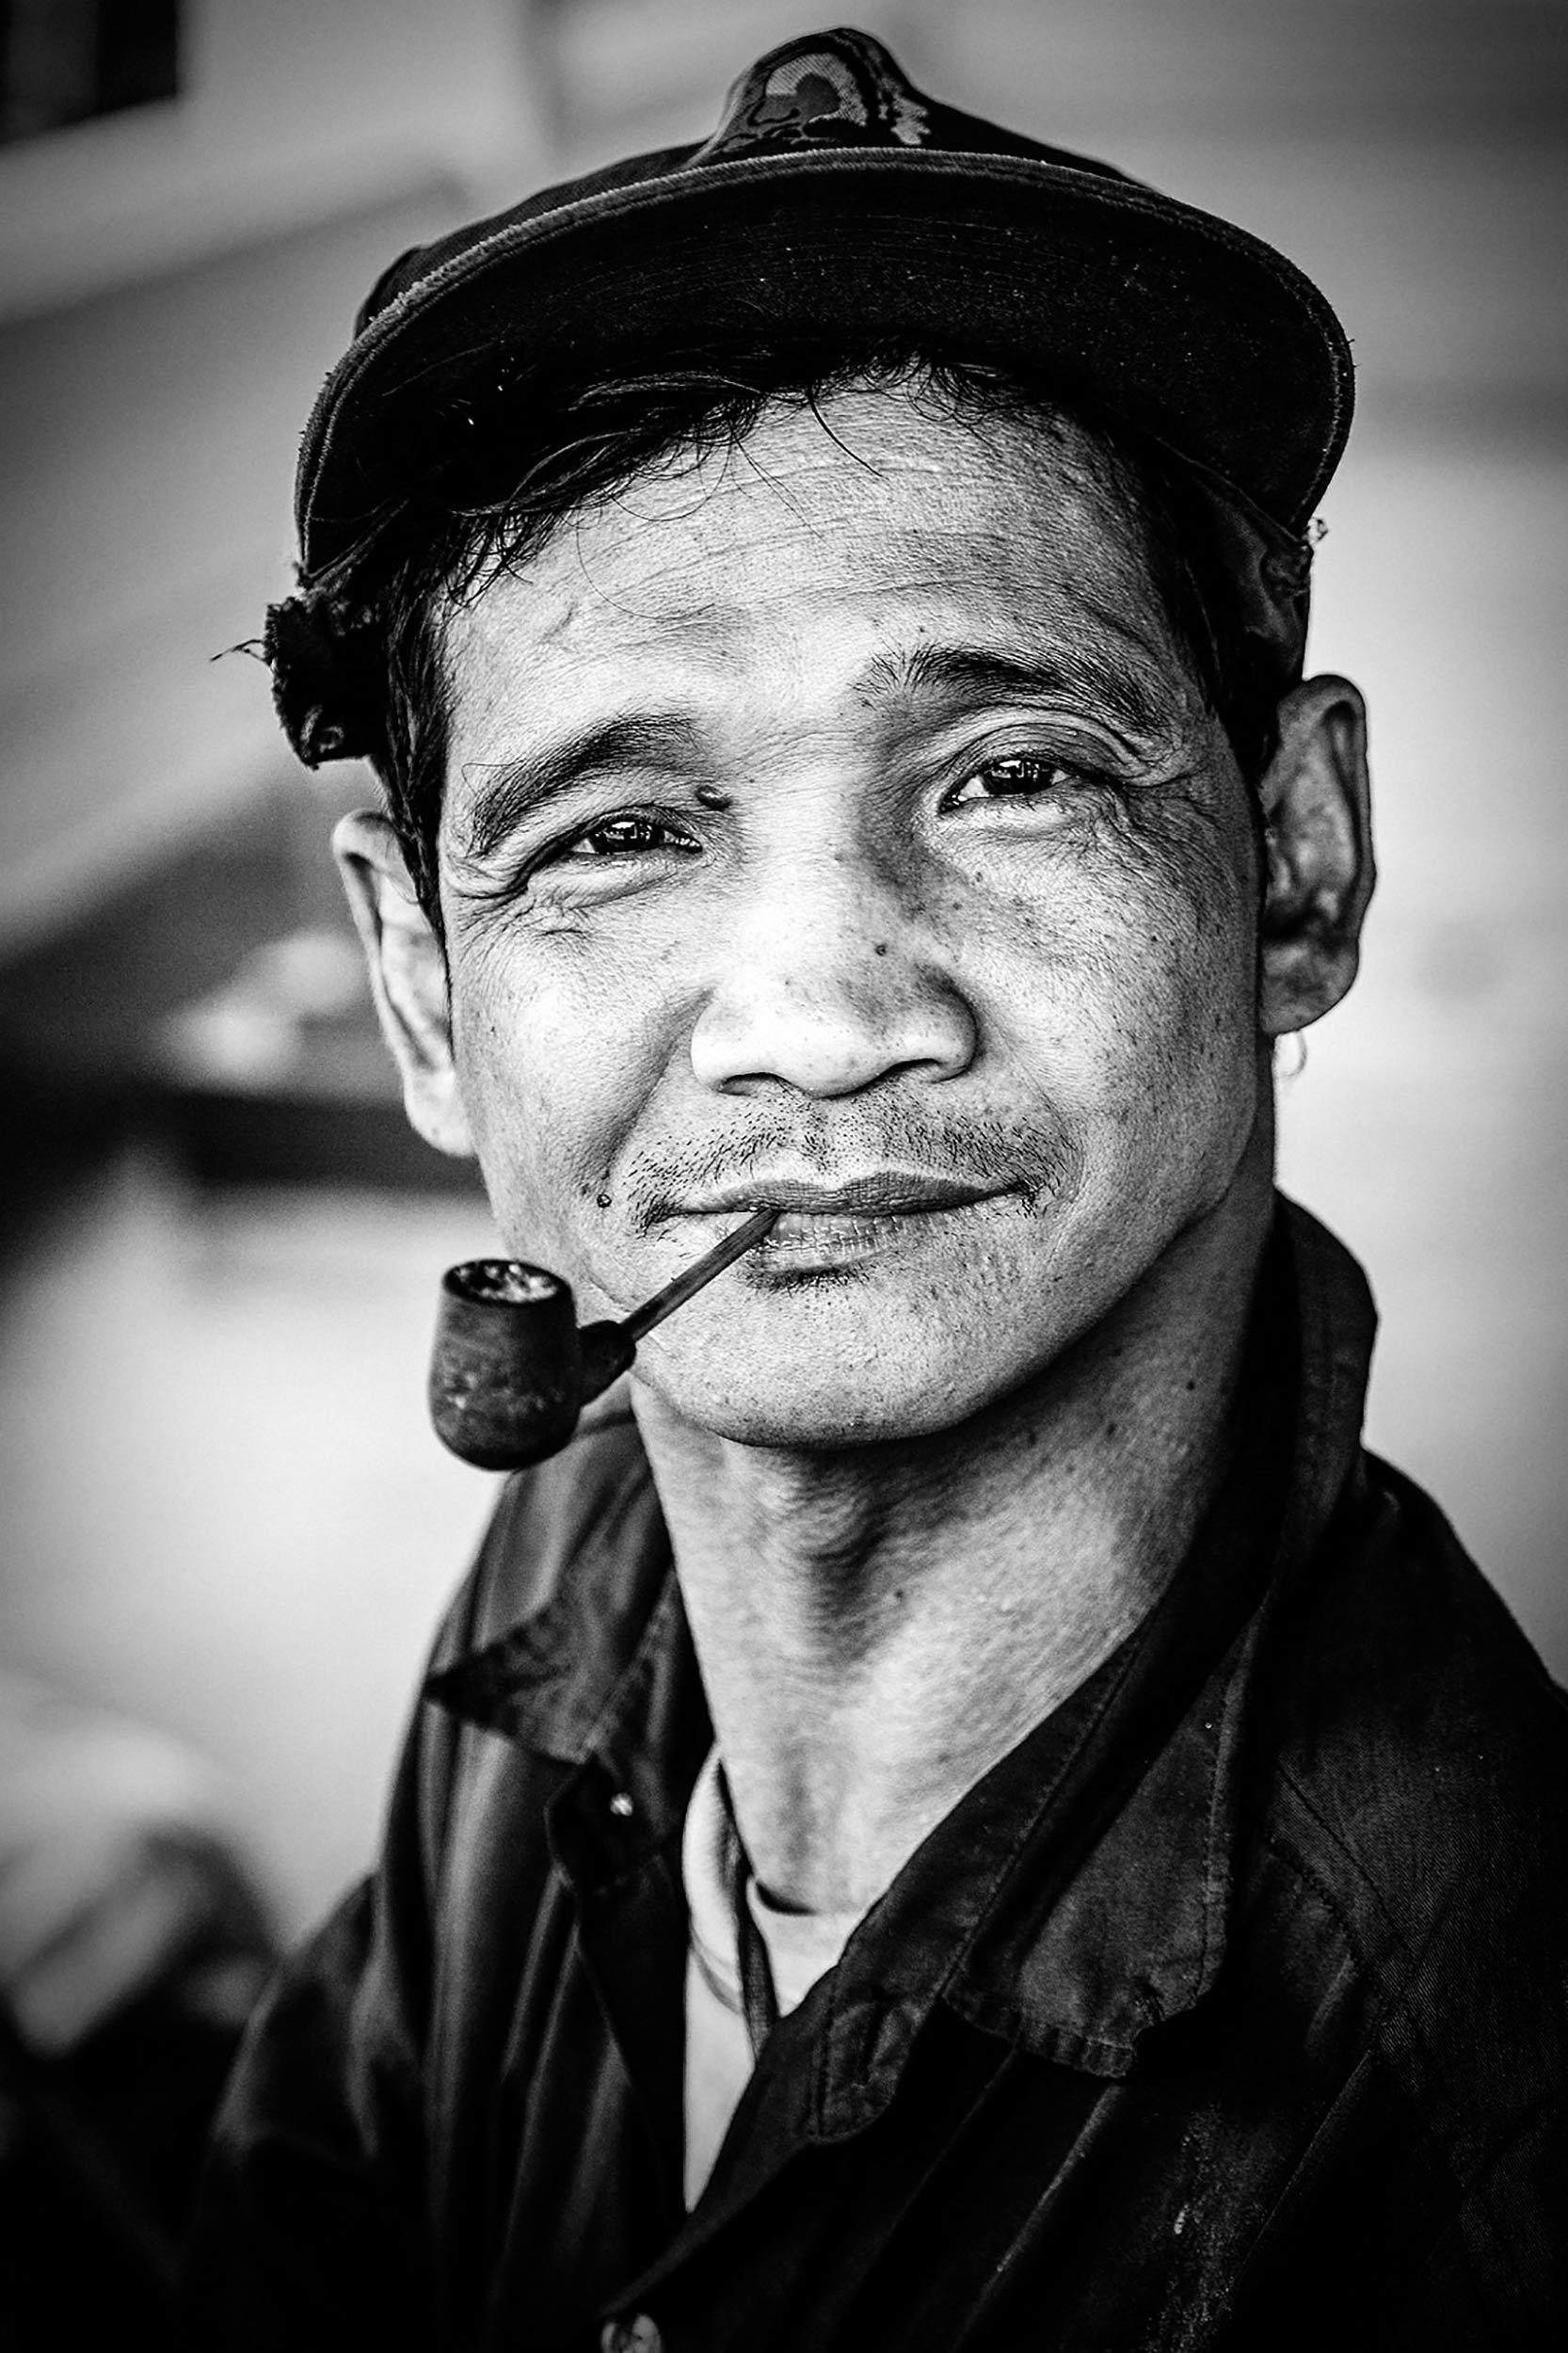 Lao Popeye